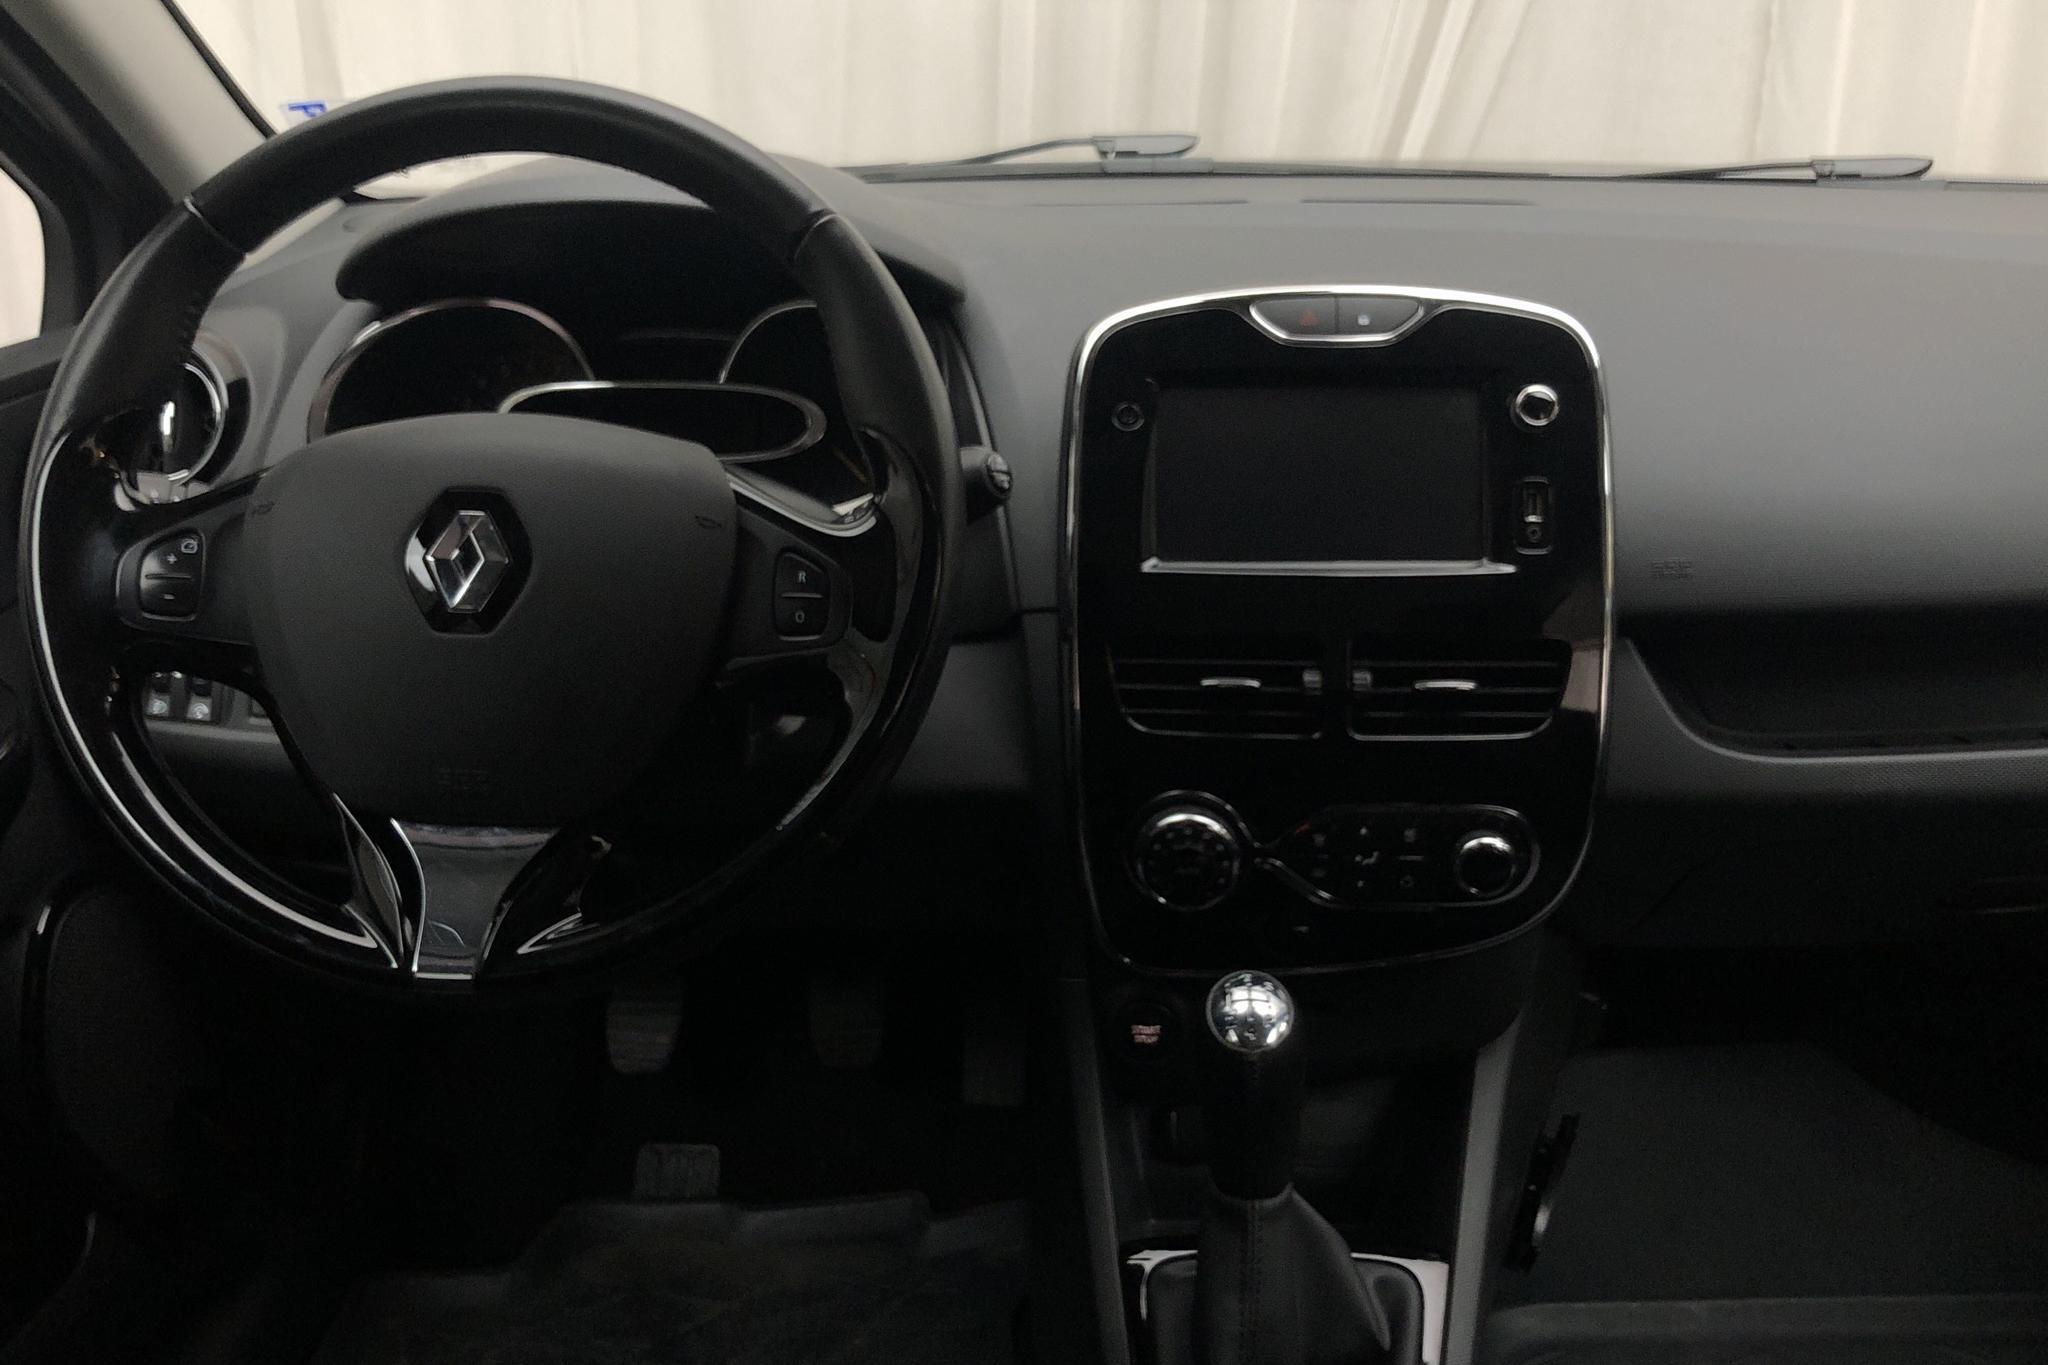 Renault Clio IV 0.9 TCe 90 5dr (90hk) - 4 649 mil - Manuell - grå - 2013